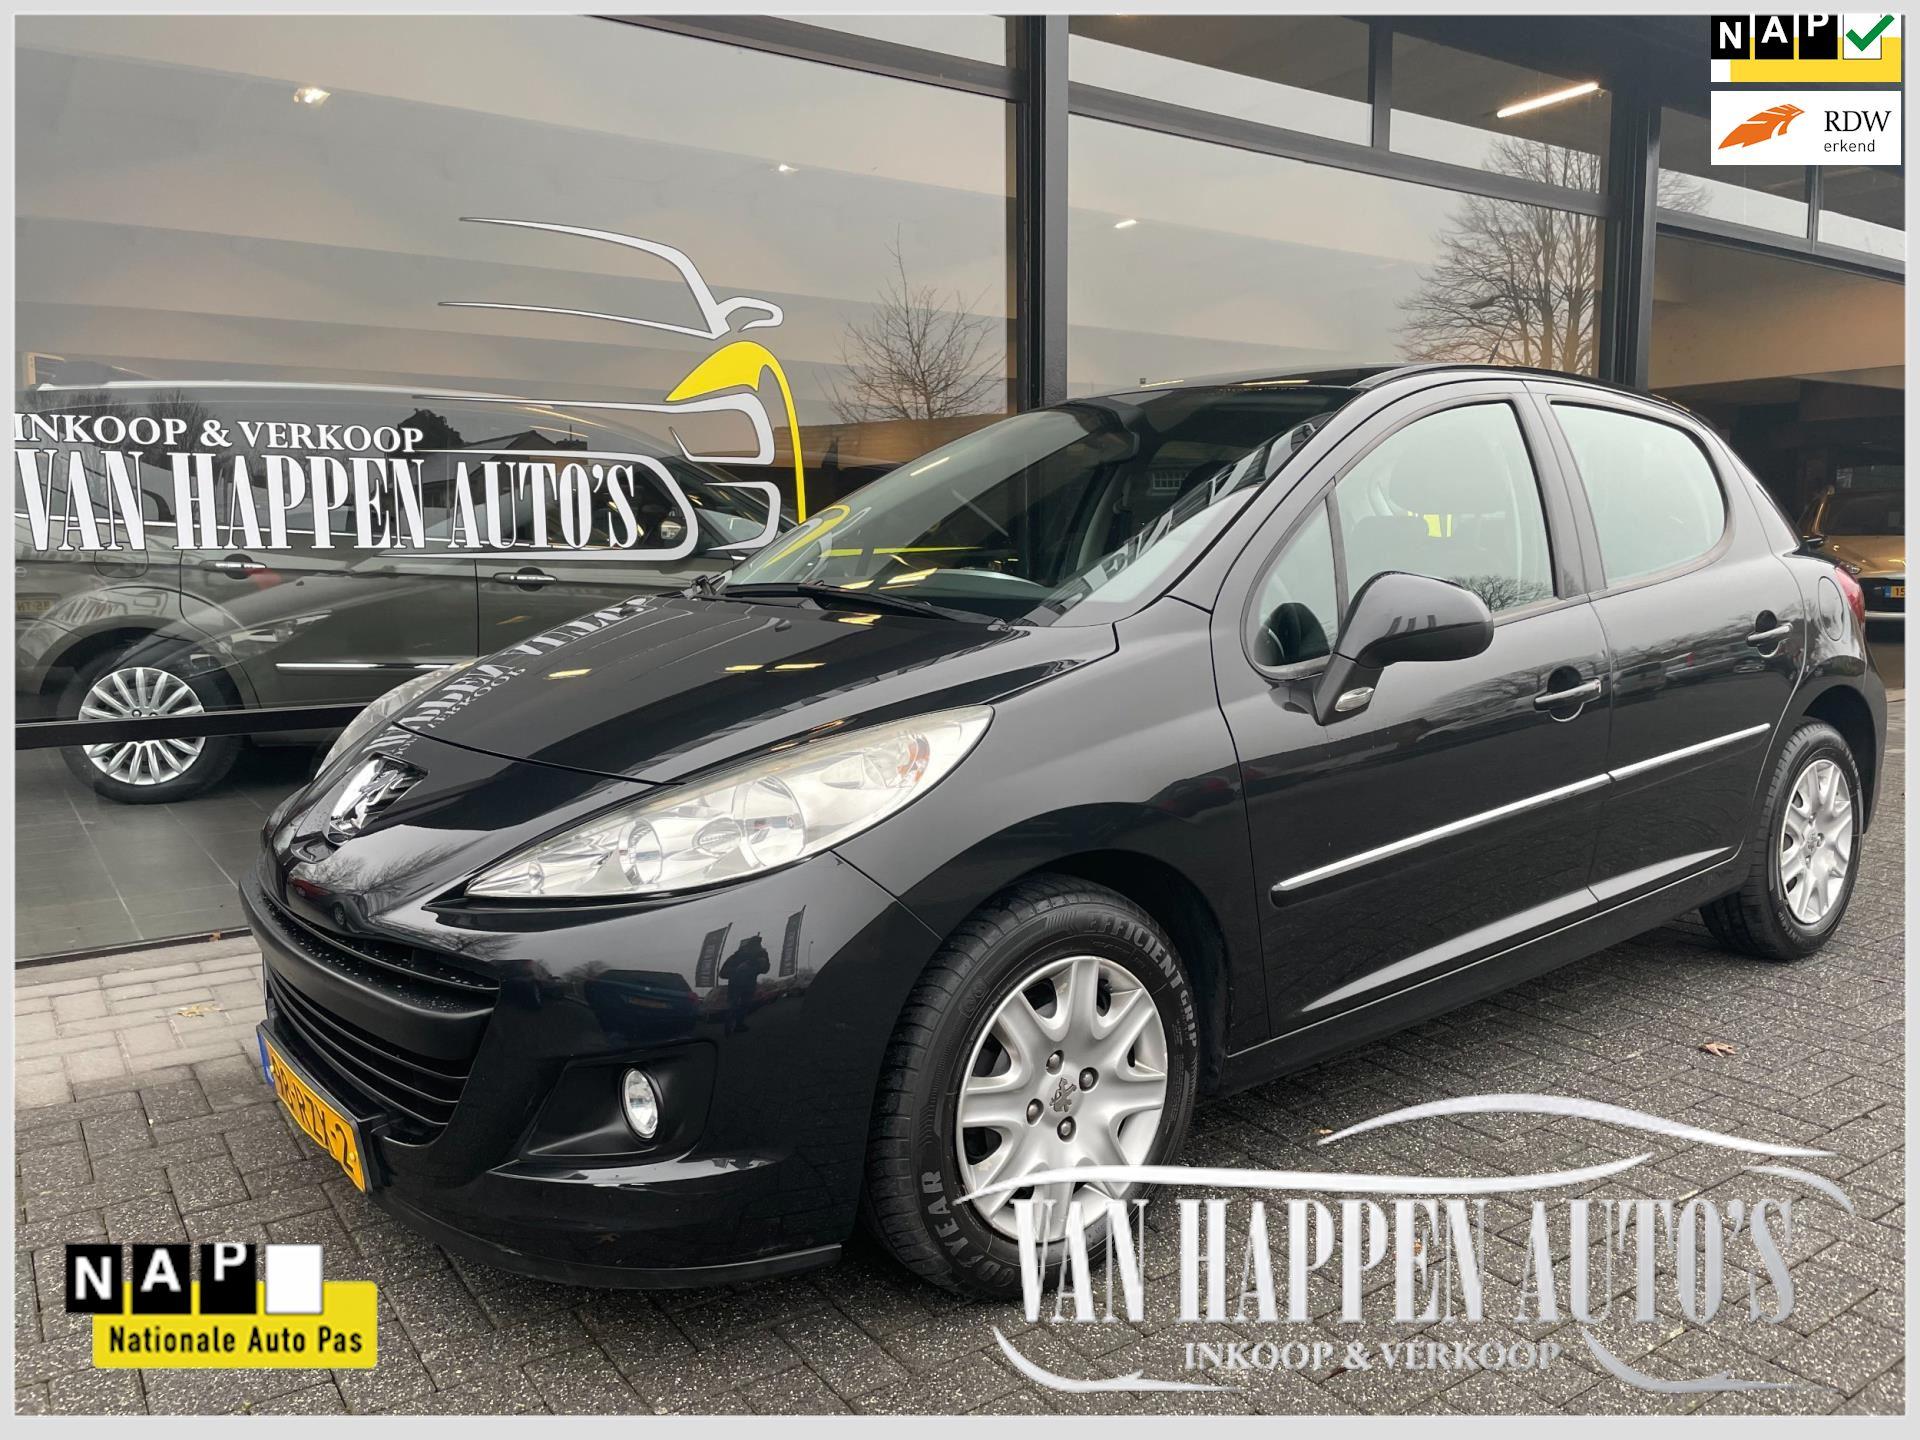 Peugeot 207 occasion - Van Happen Auto's